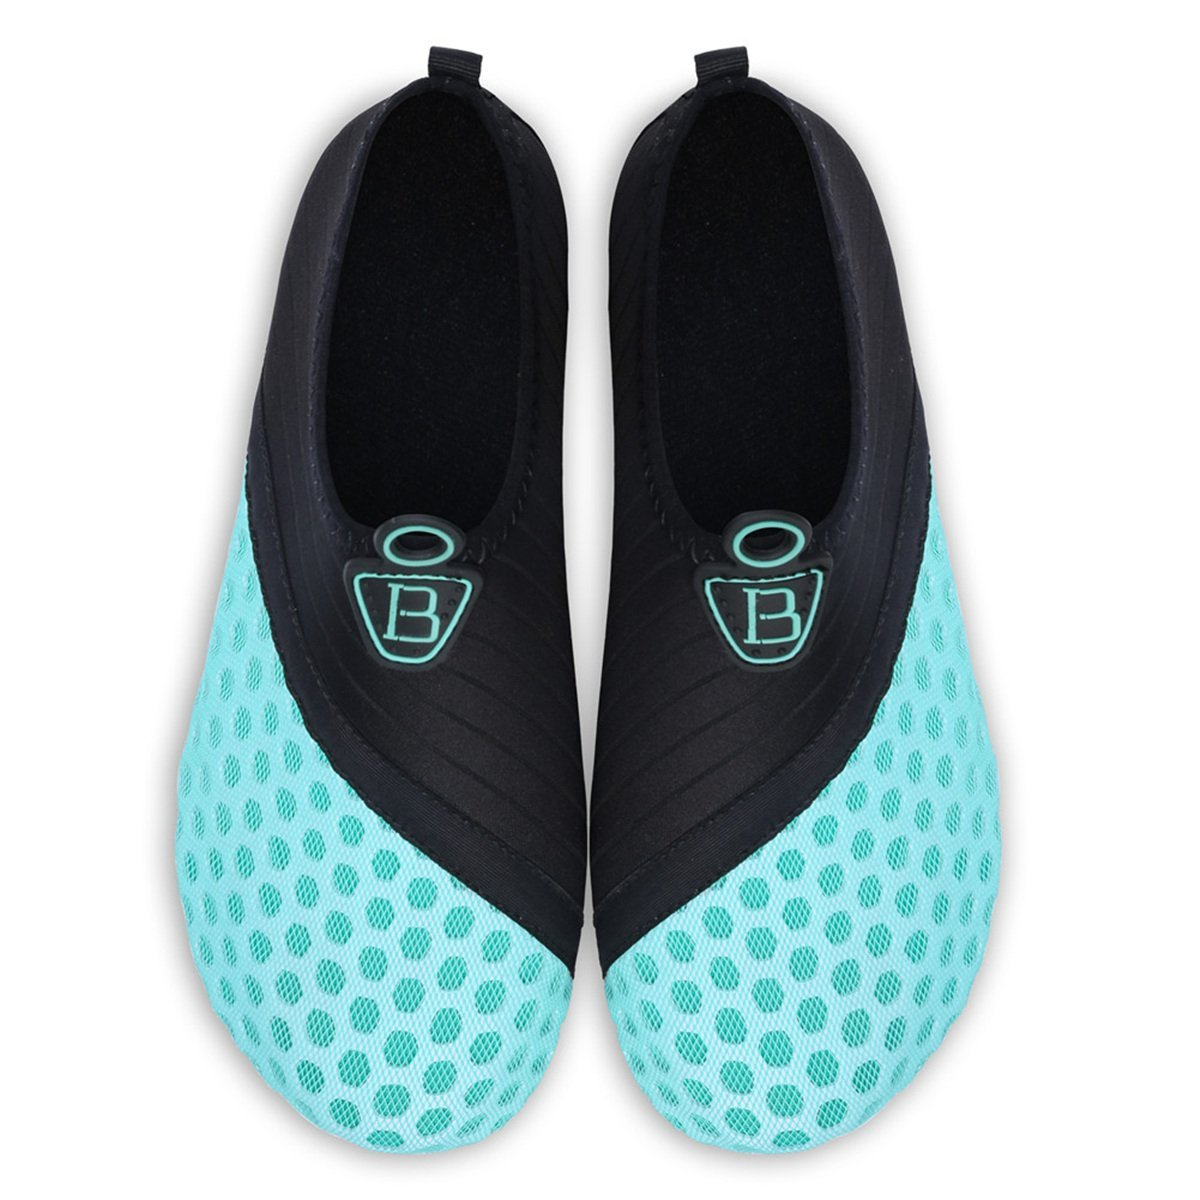 Barerun Barefoot Quick-Dry Water Sports Shoes Aqua Socks for Swim Beach Pool Surf Yoga for Women Men 8.5-9.5 US Women by Barerun (Image #5)